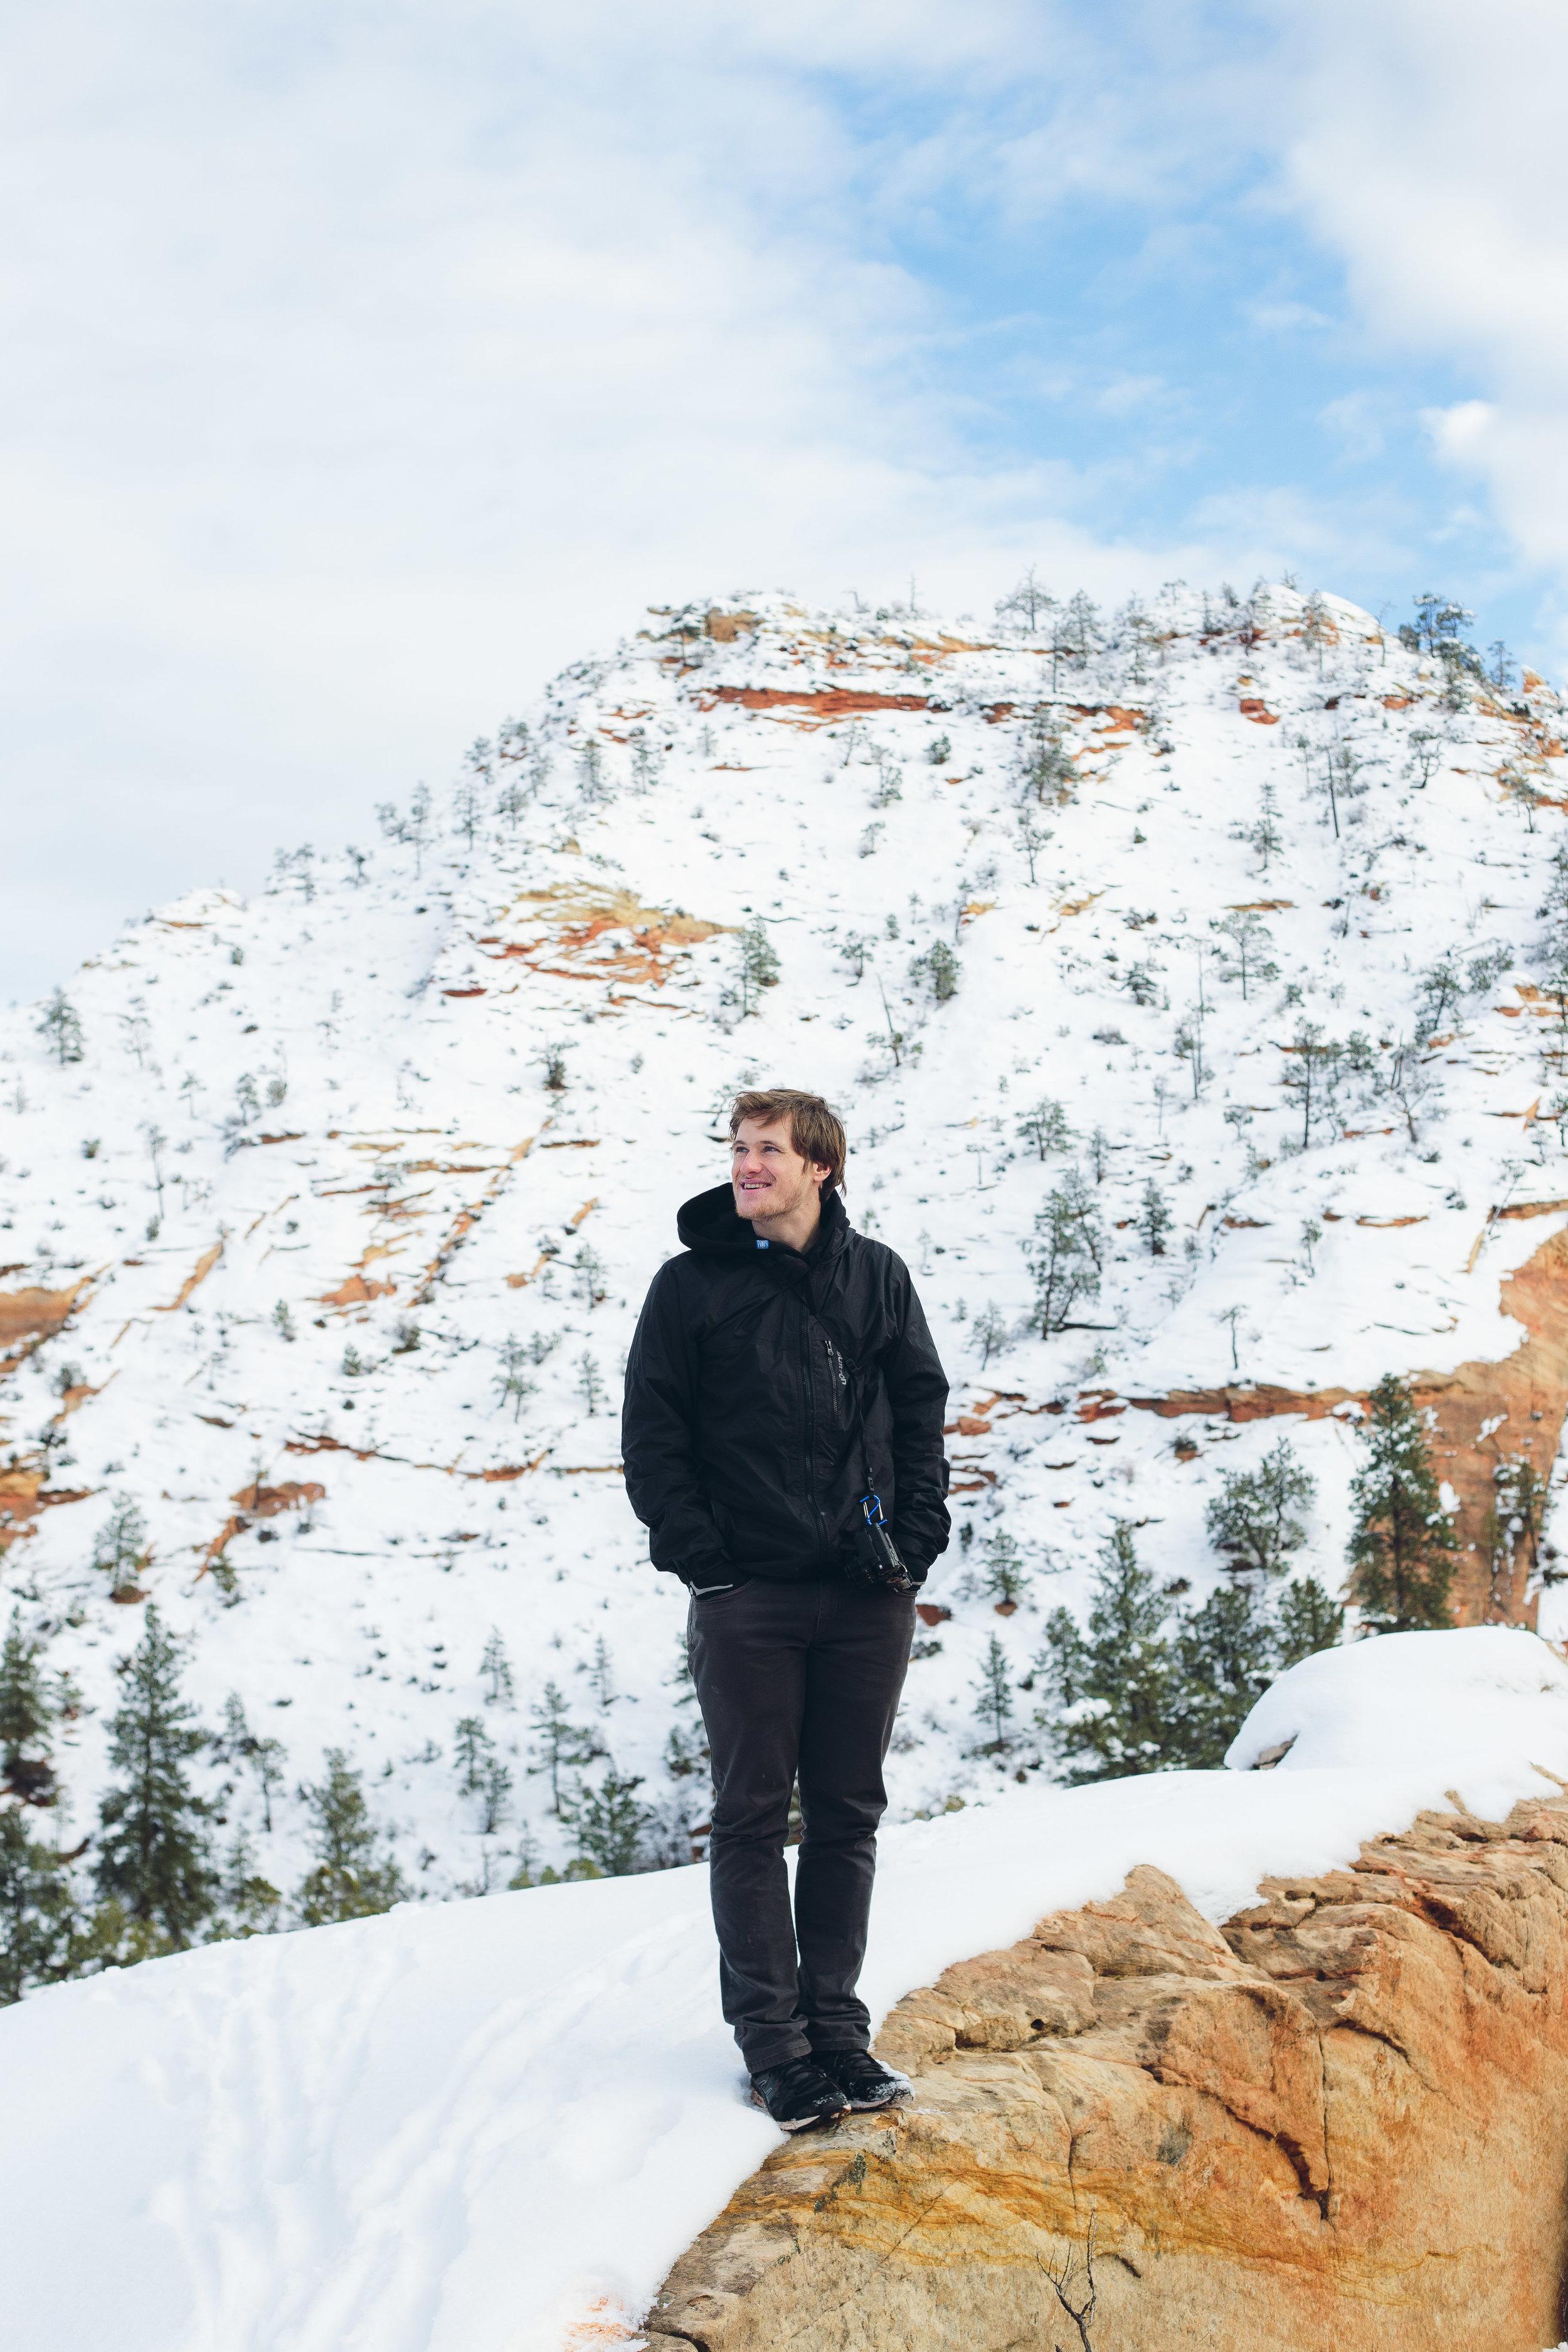 Zion National Park hikes winter portraits